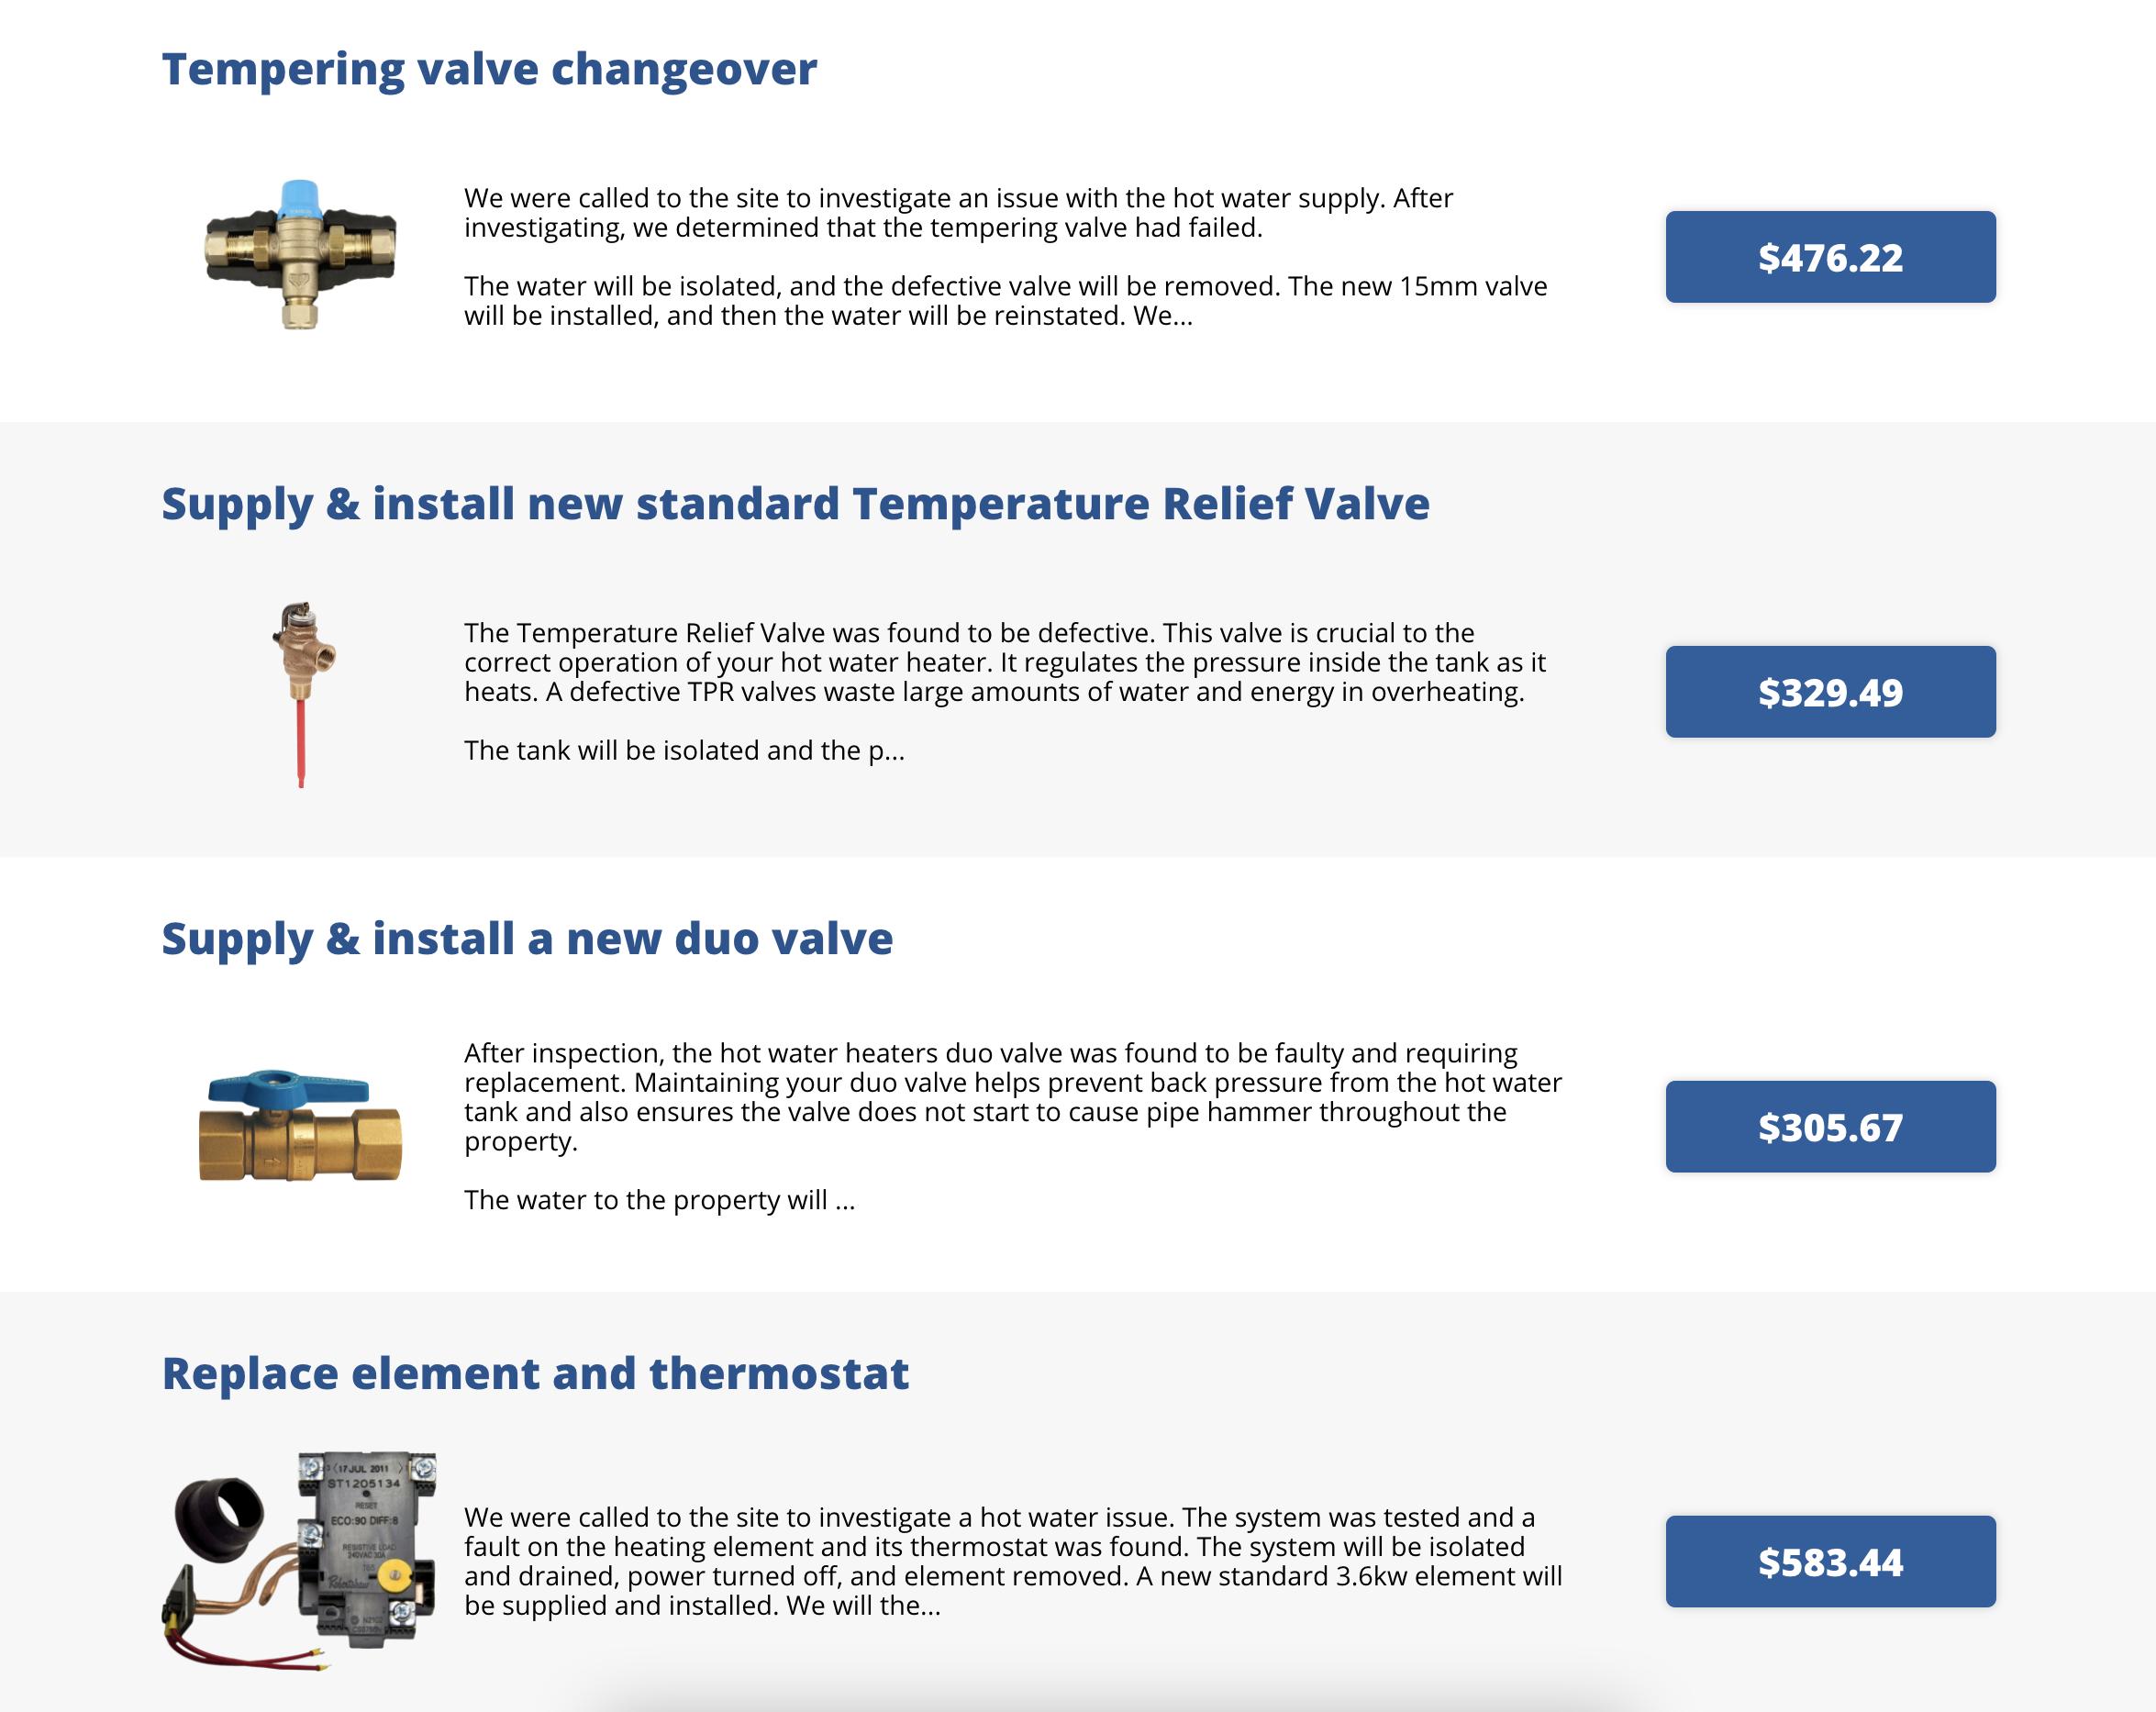 FieldPulse Pricebook feature displaying plumbing options